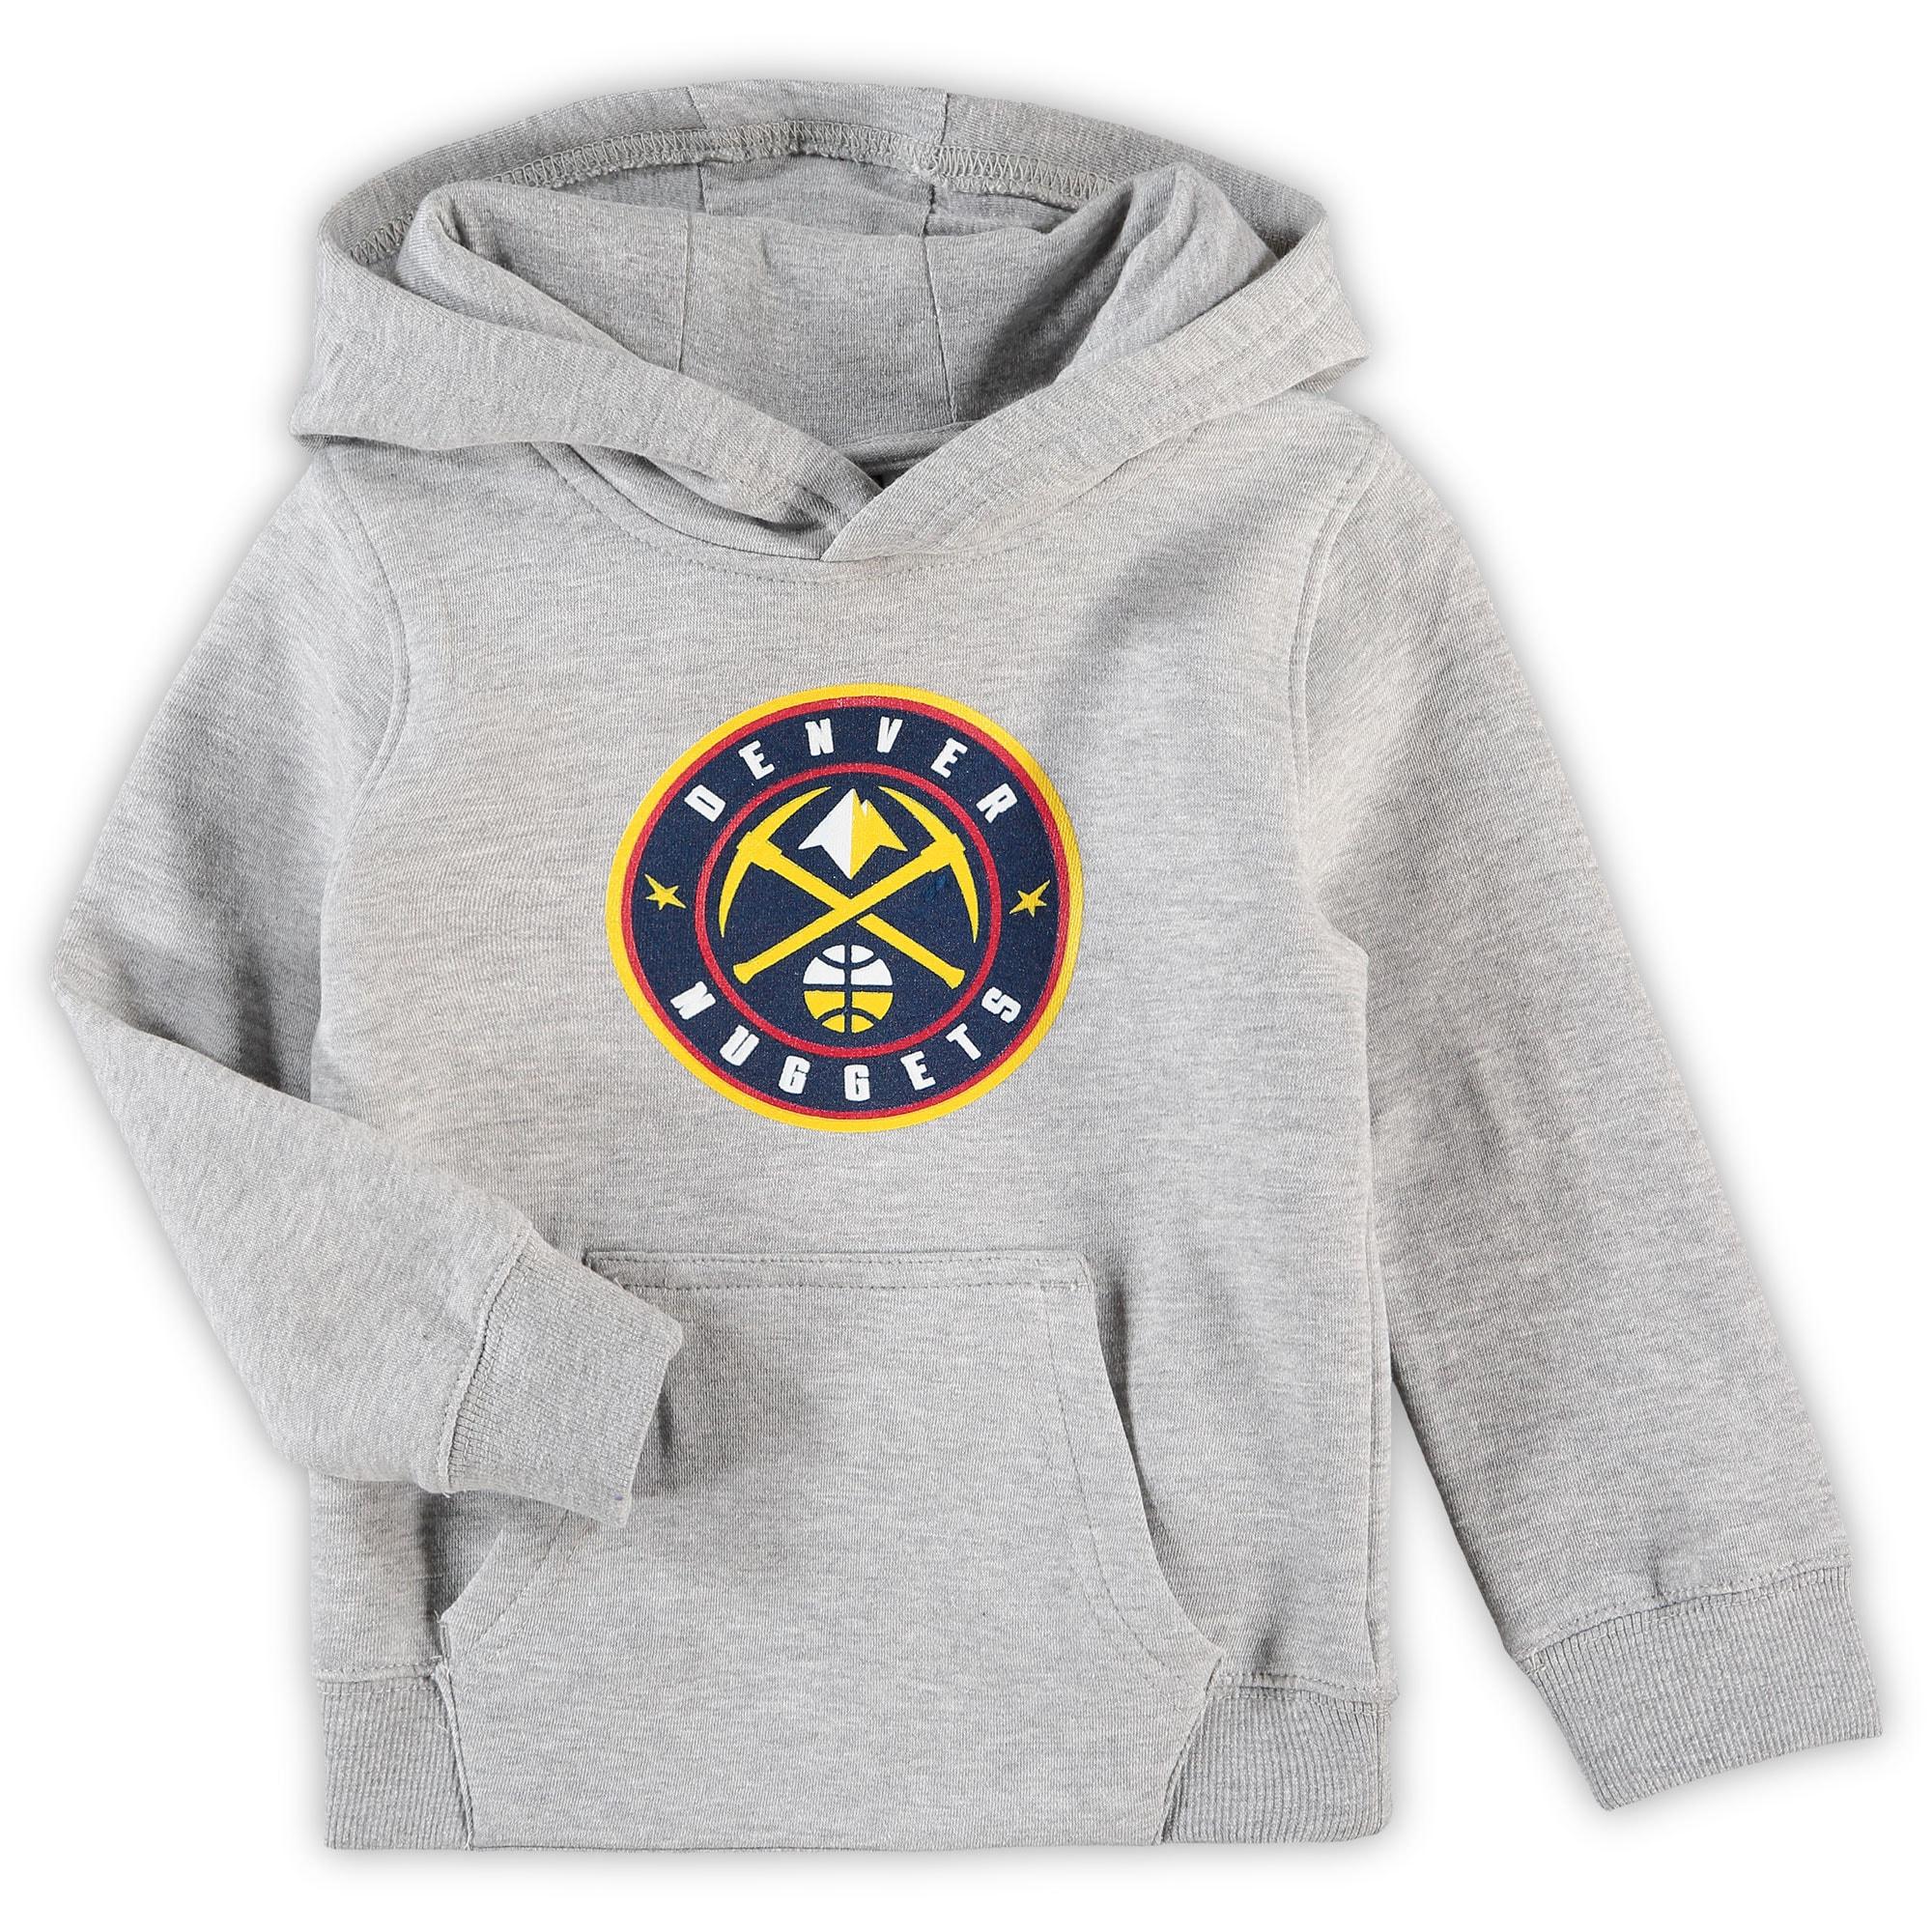 Denver Nuggets Preschool Primary Team Logo Pullover Hoodie - Heathered Gray